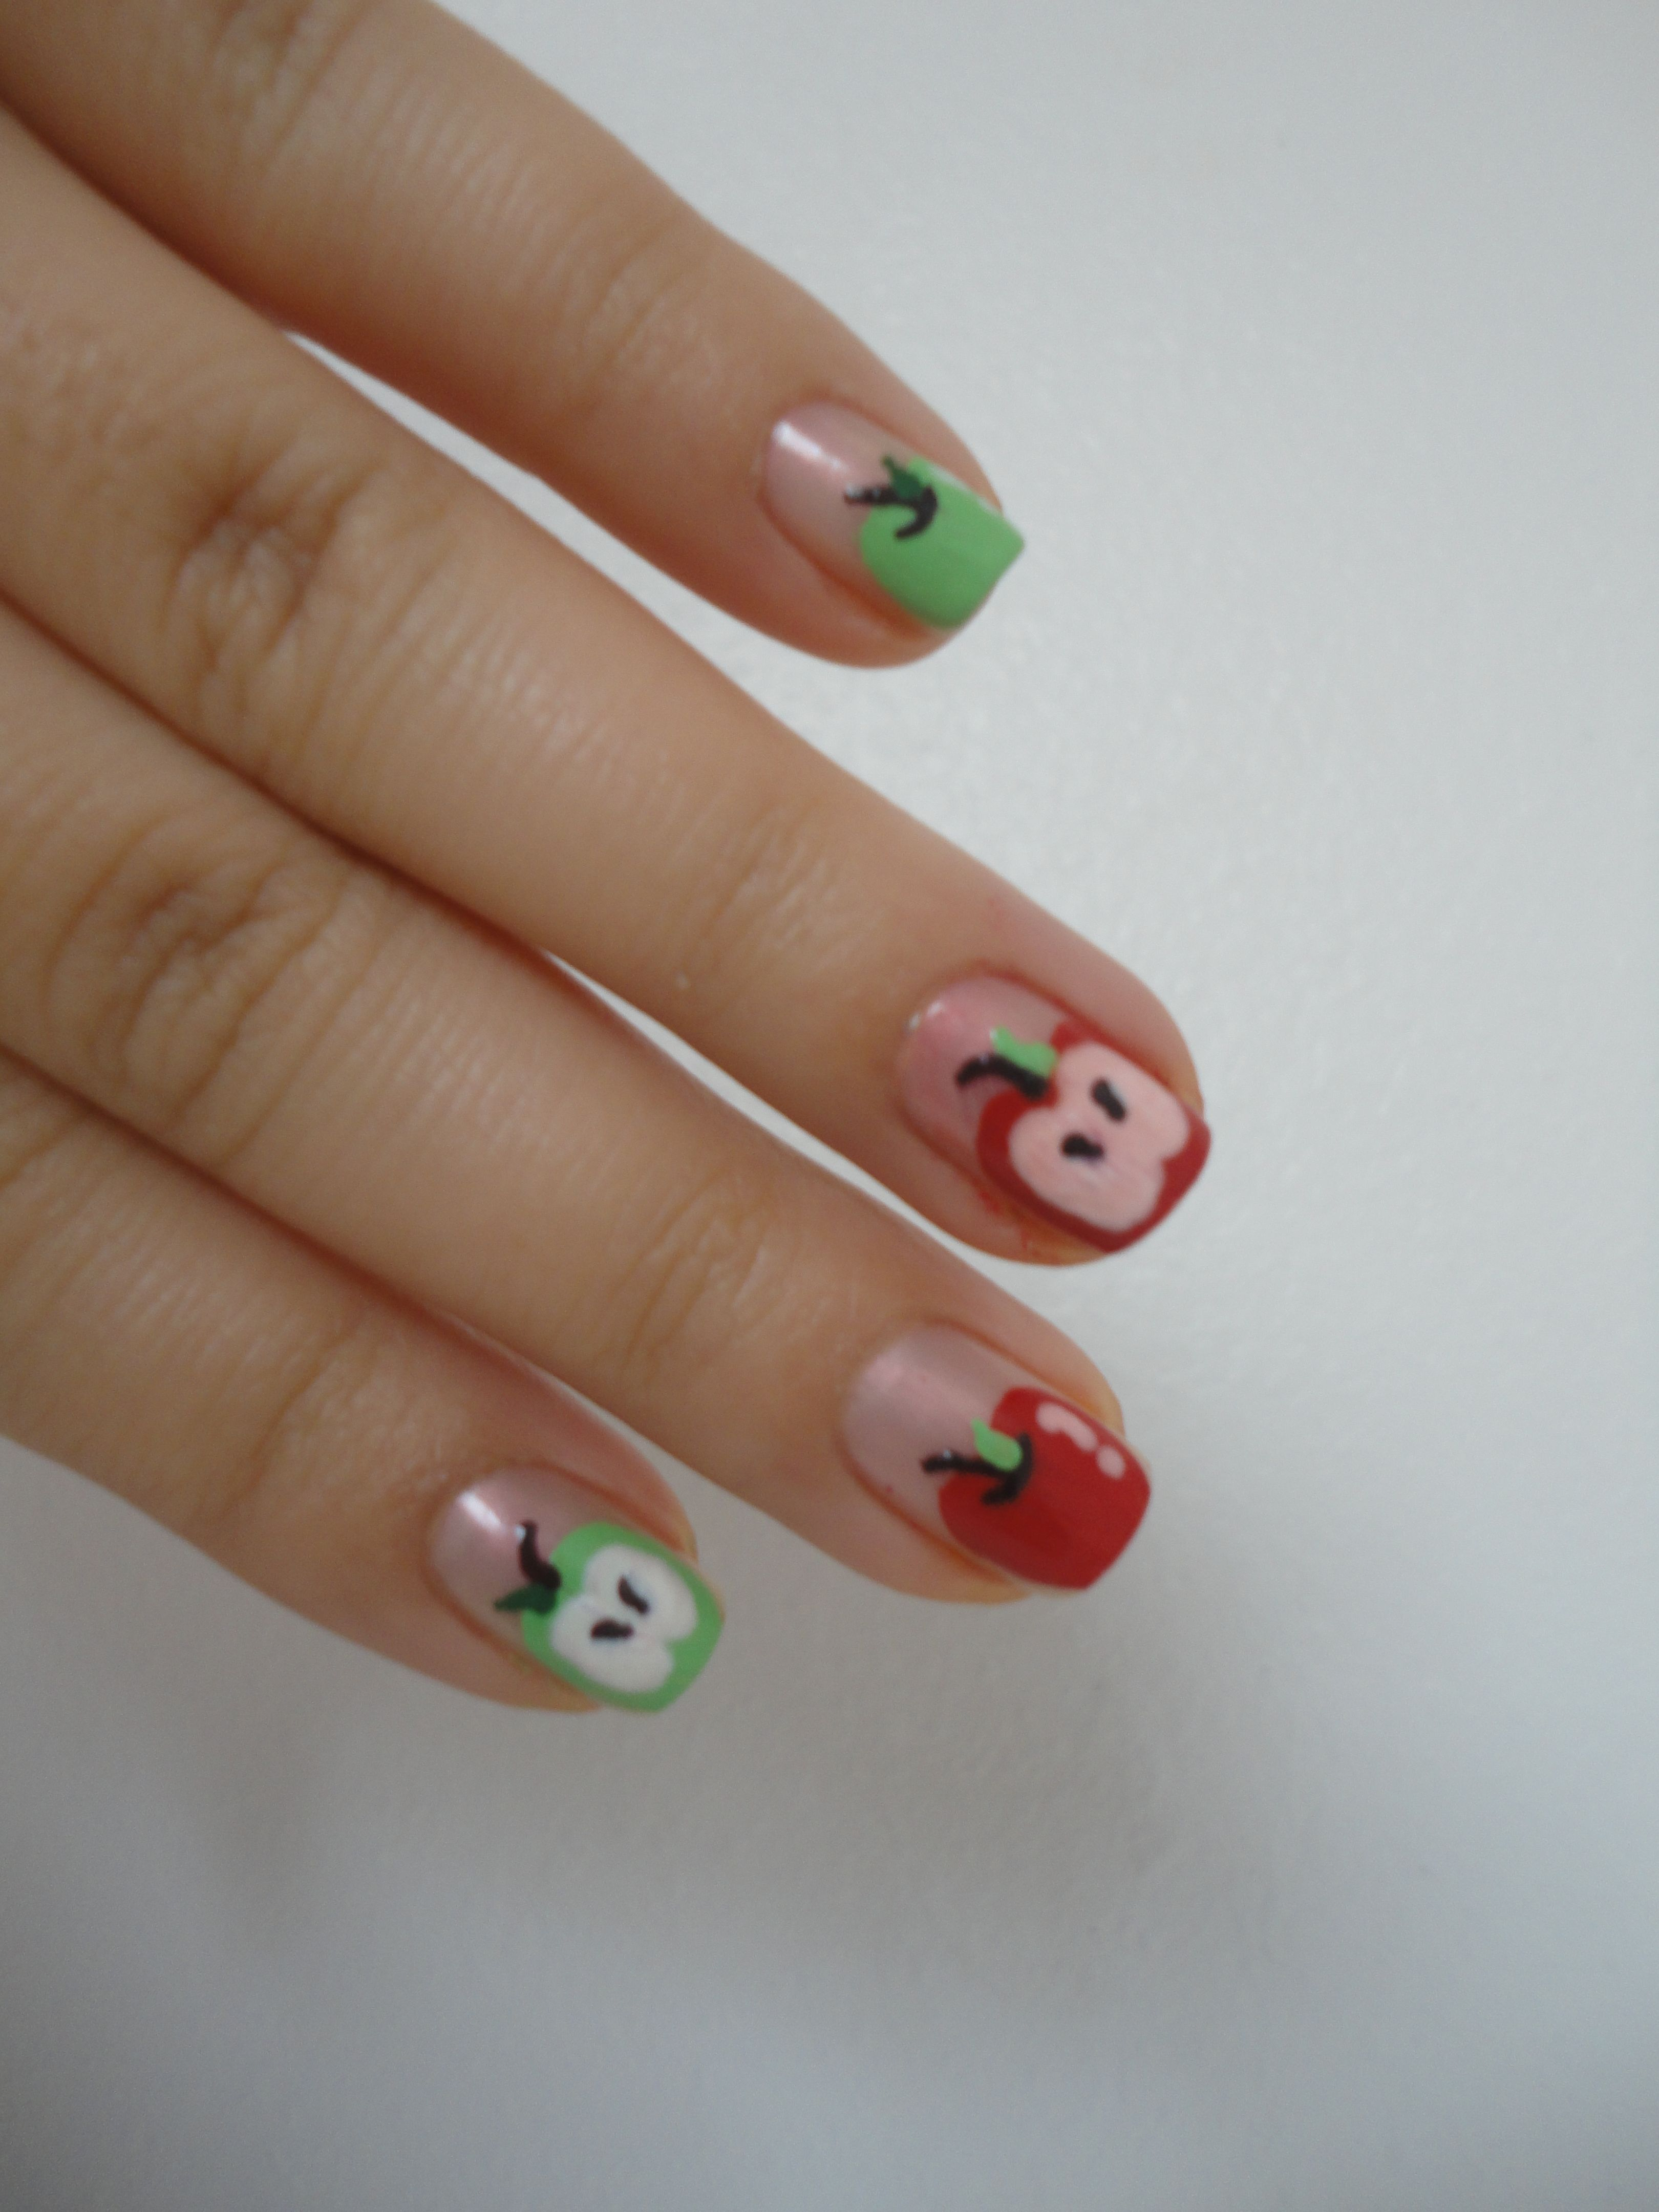 apple nails inspired by bubzbeauty fruits nail